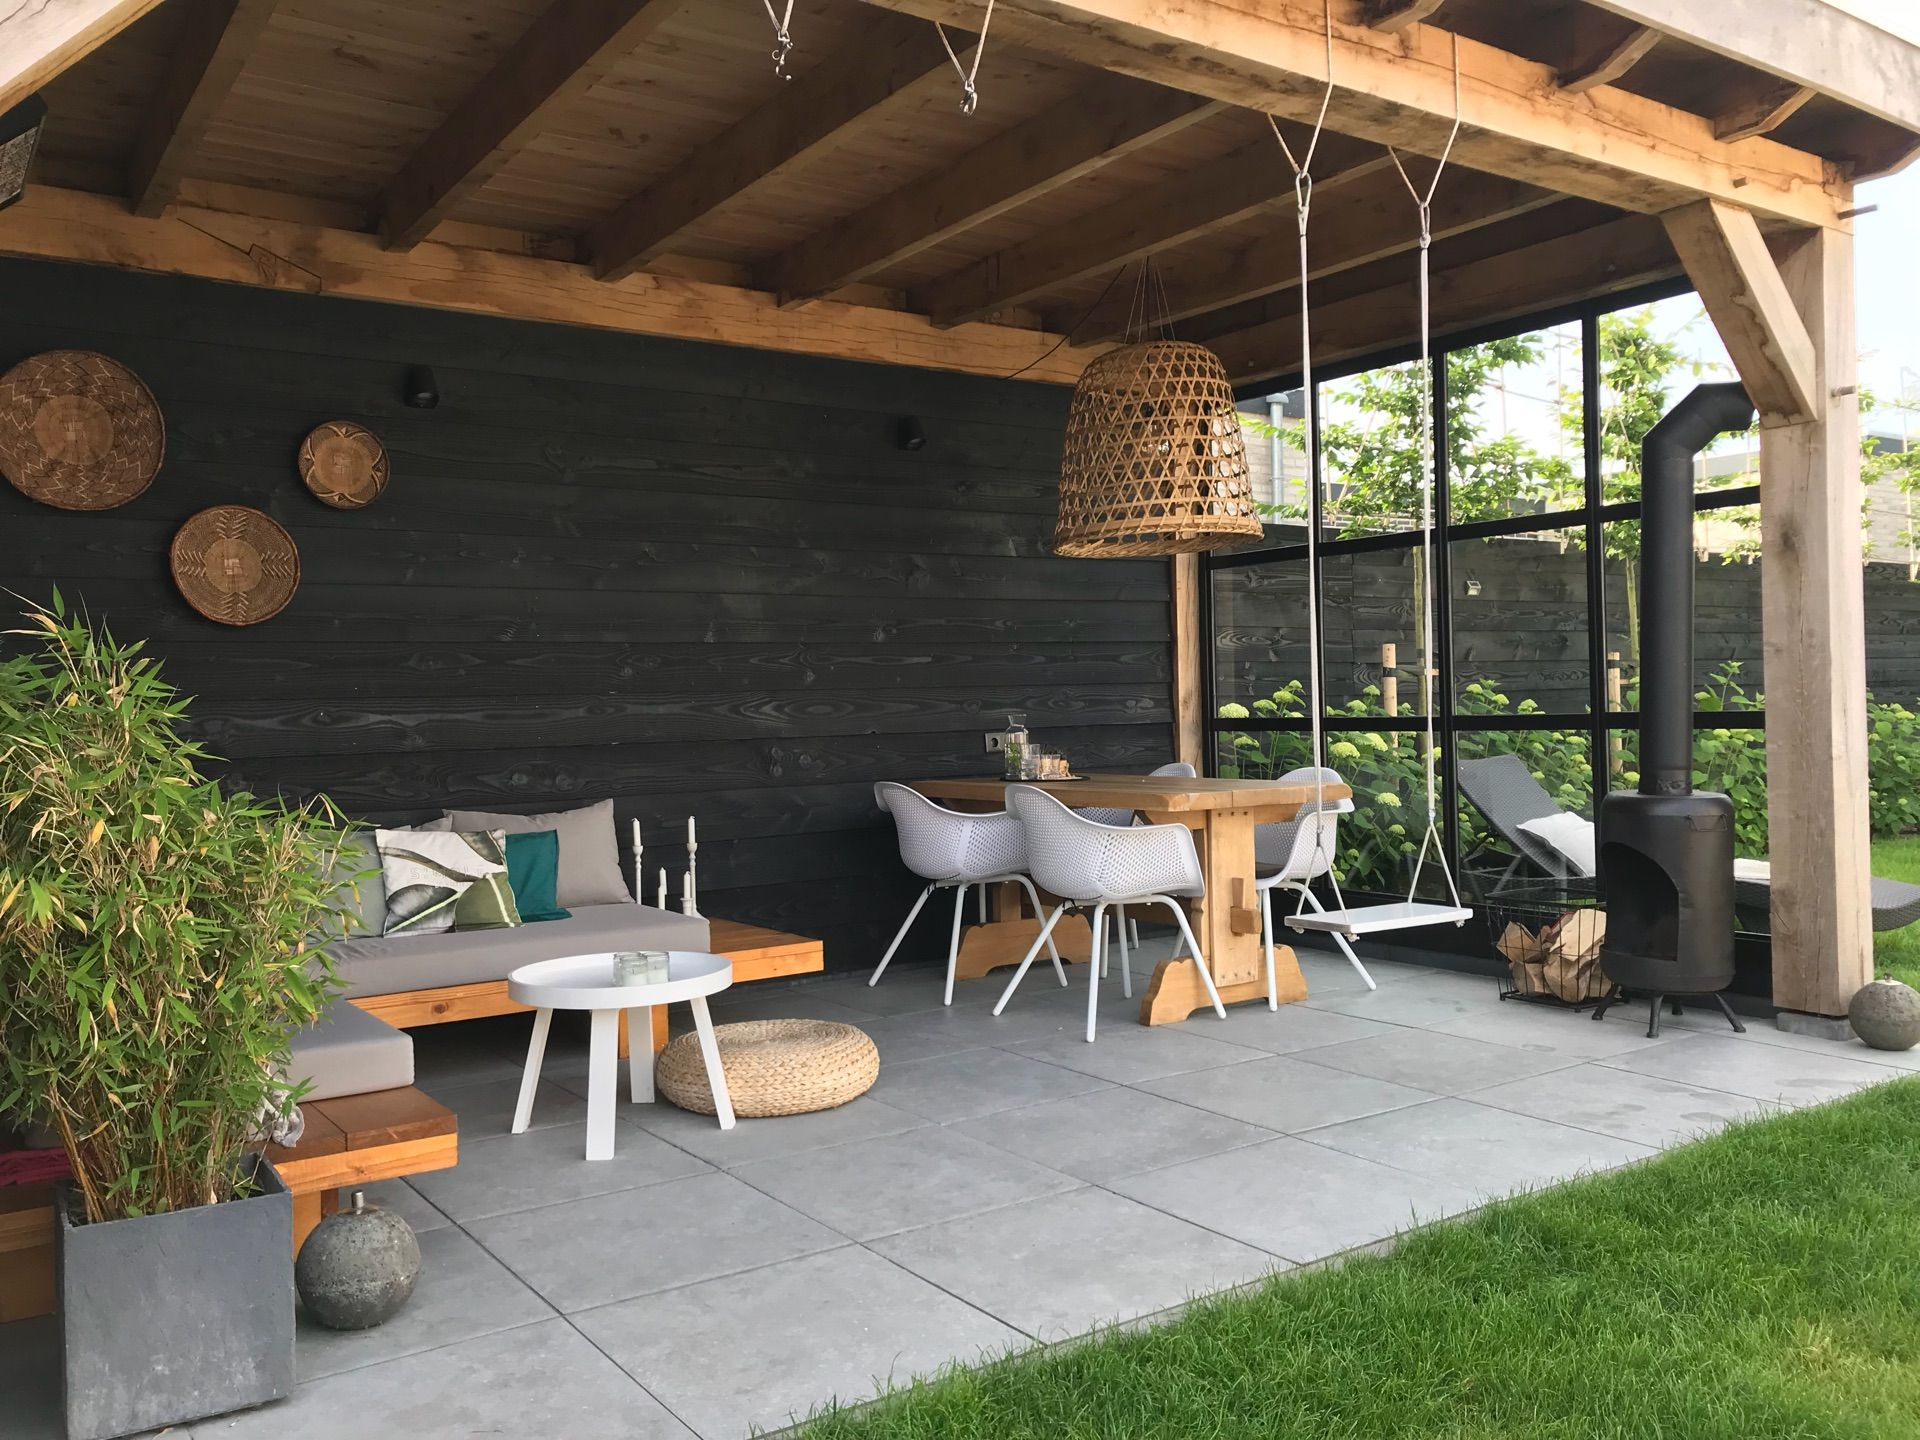 idee voor moderne tuinoverkapping